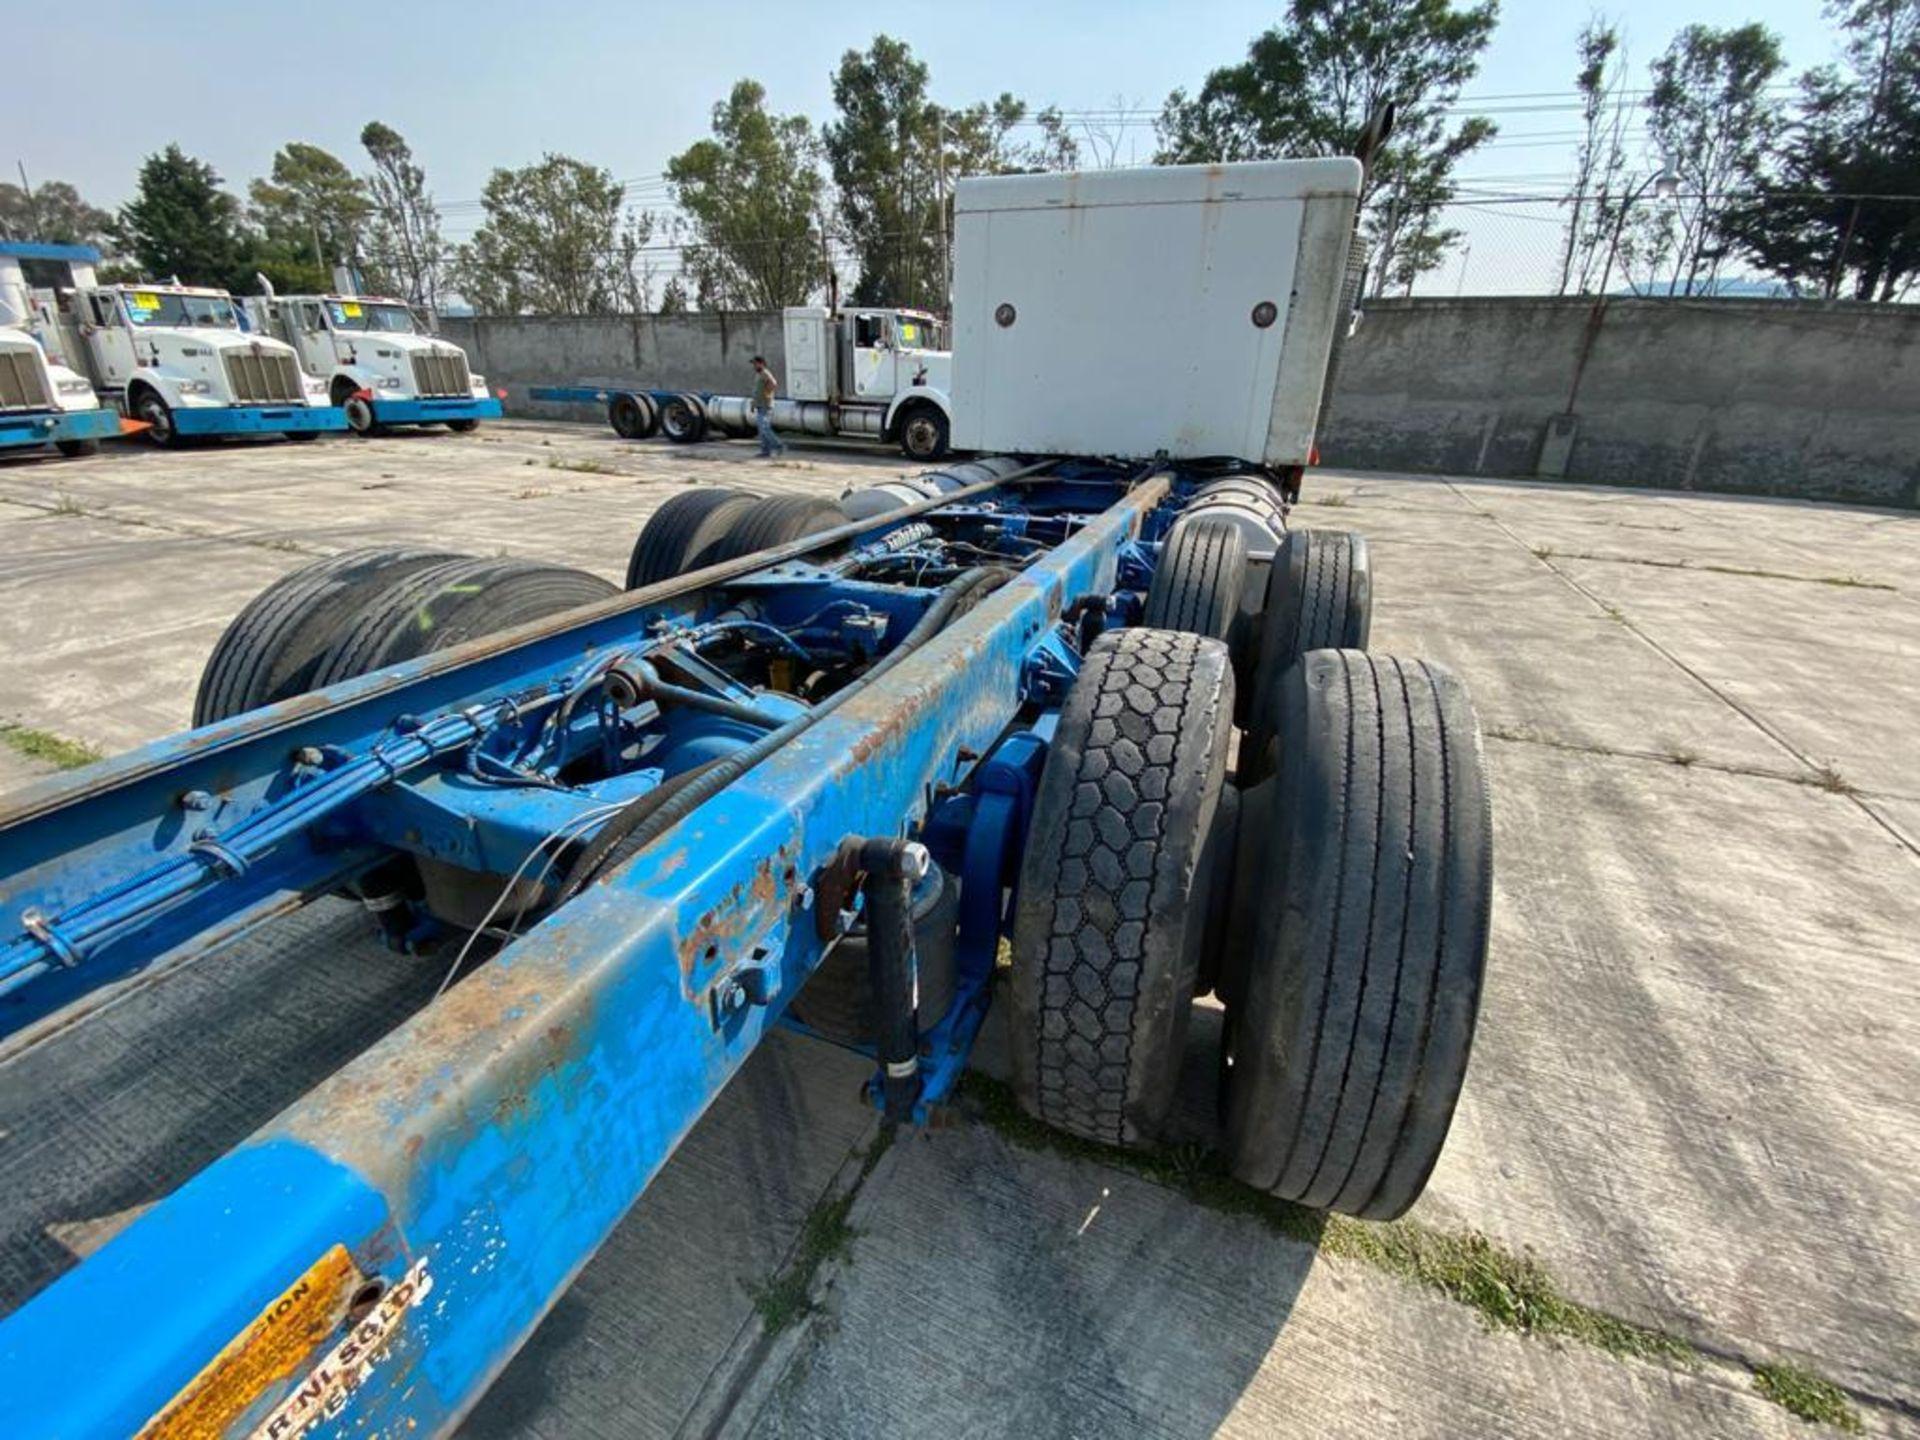 1998 Kenworth Sleeper truck tractor, standard transmission of 18 speeds - Image 21 of 75